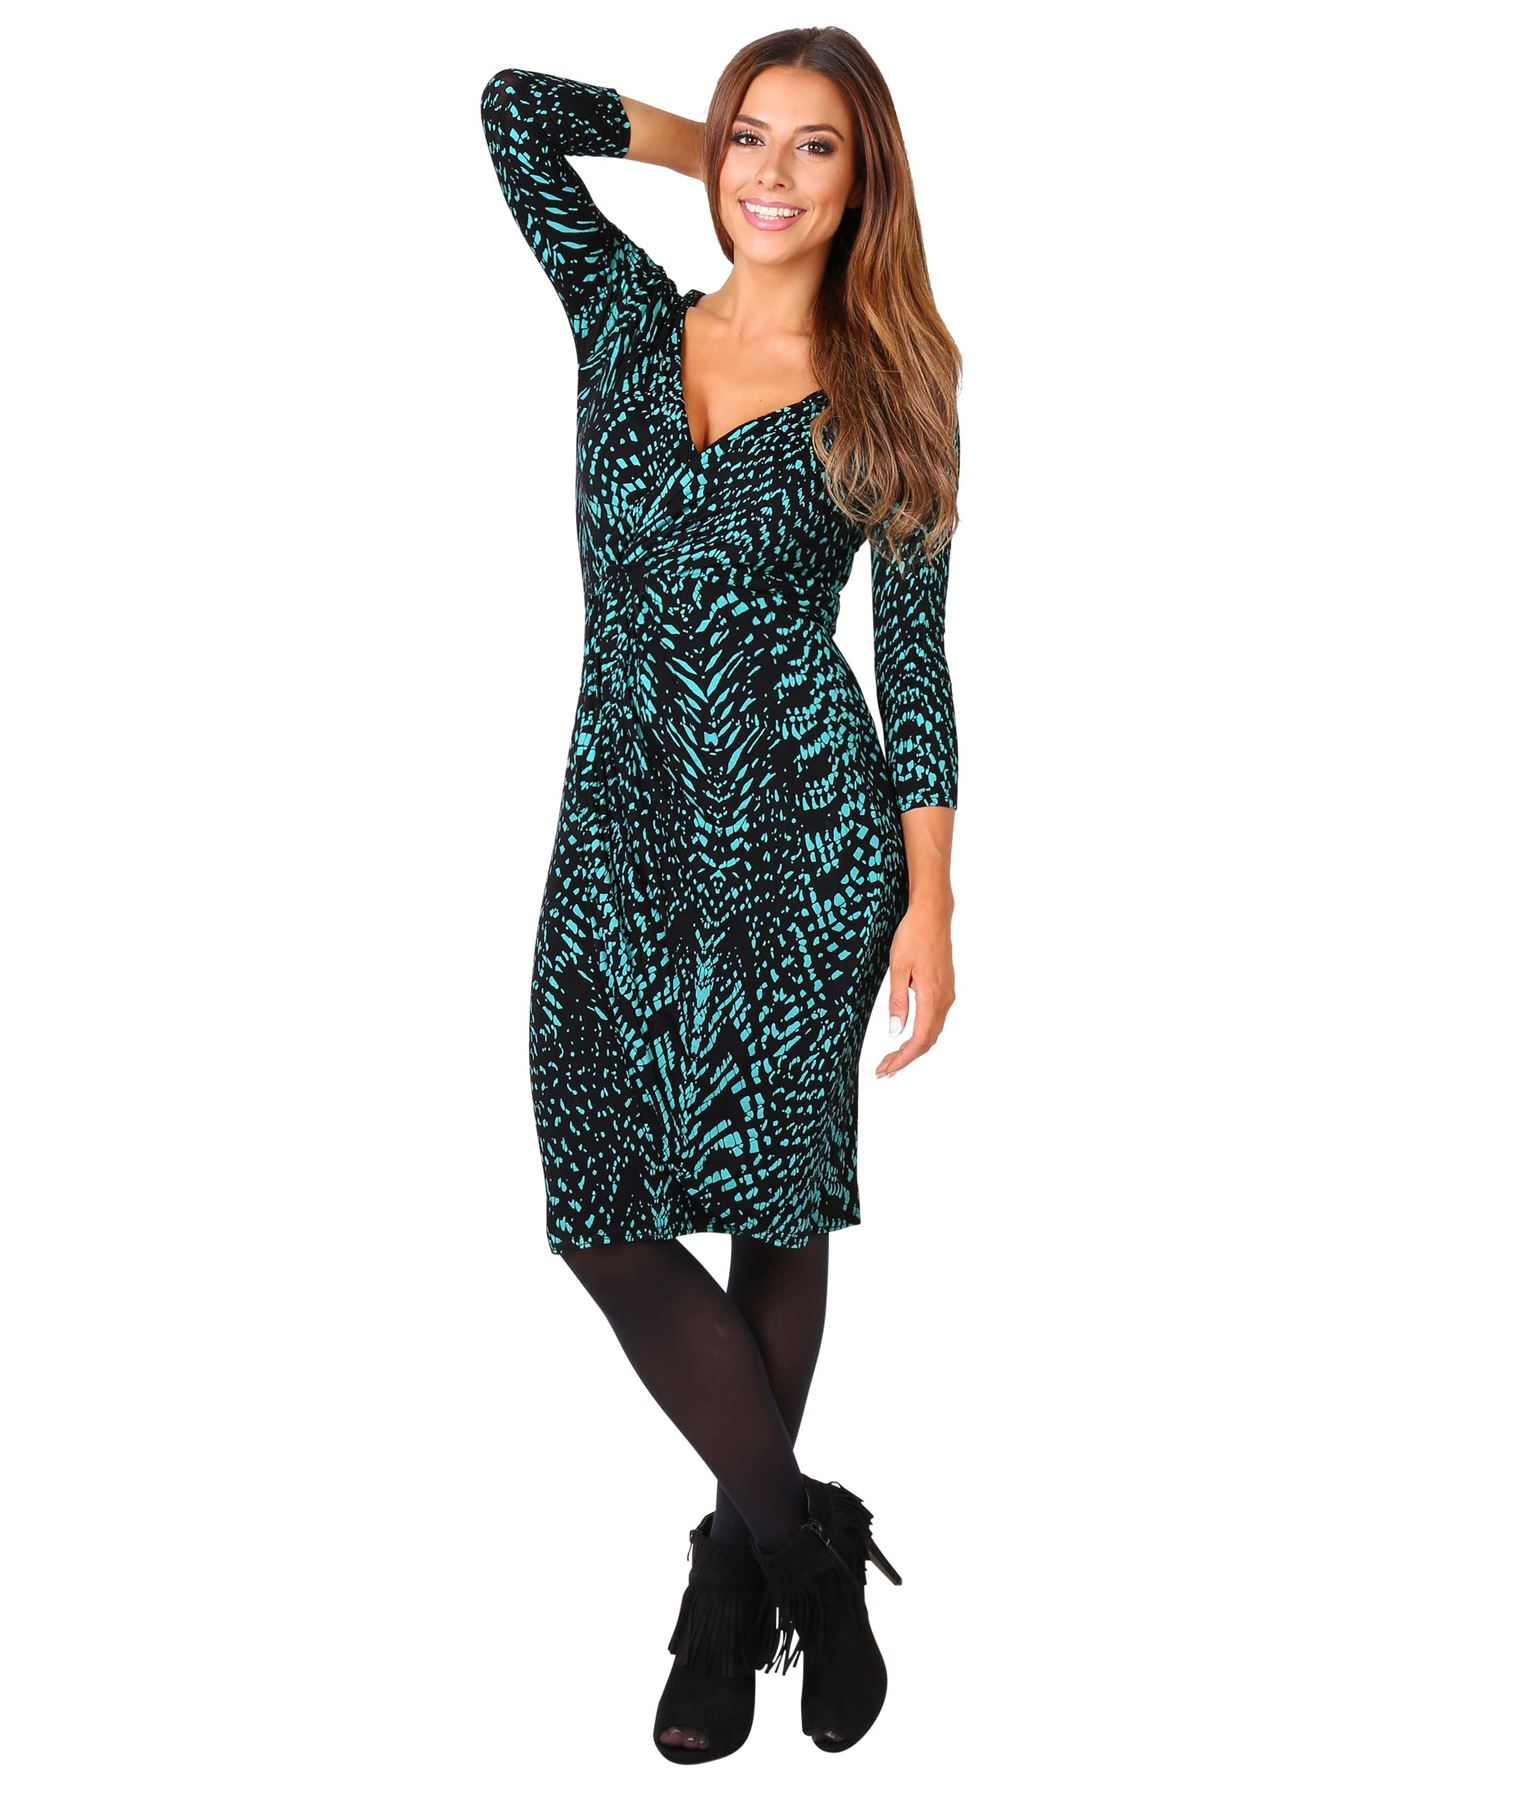 Womens-V-Neck-Dress-Top-Bodycon-Skirt-Midi-Snakeskin-Print-Cross-Over-Party-Wrap thumbnail 18